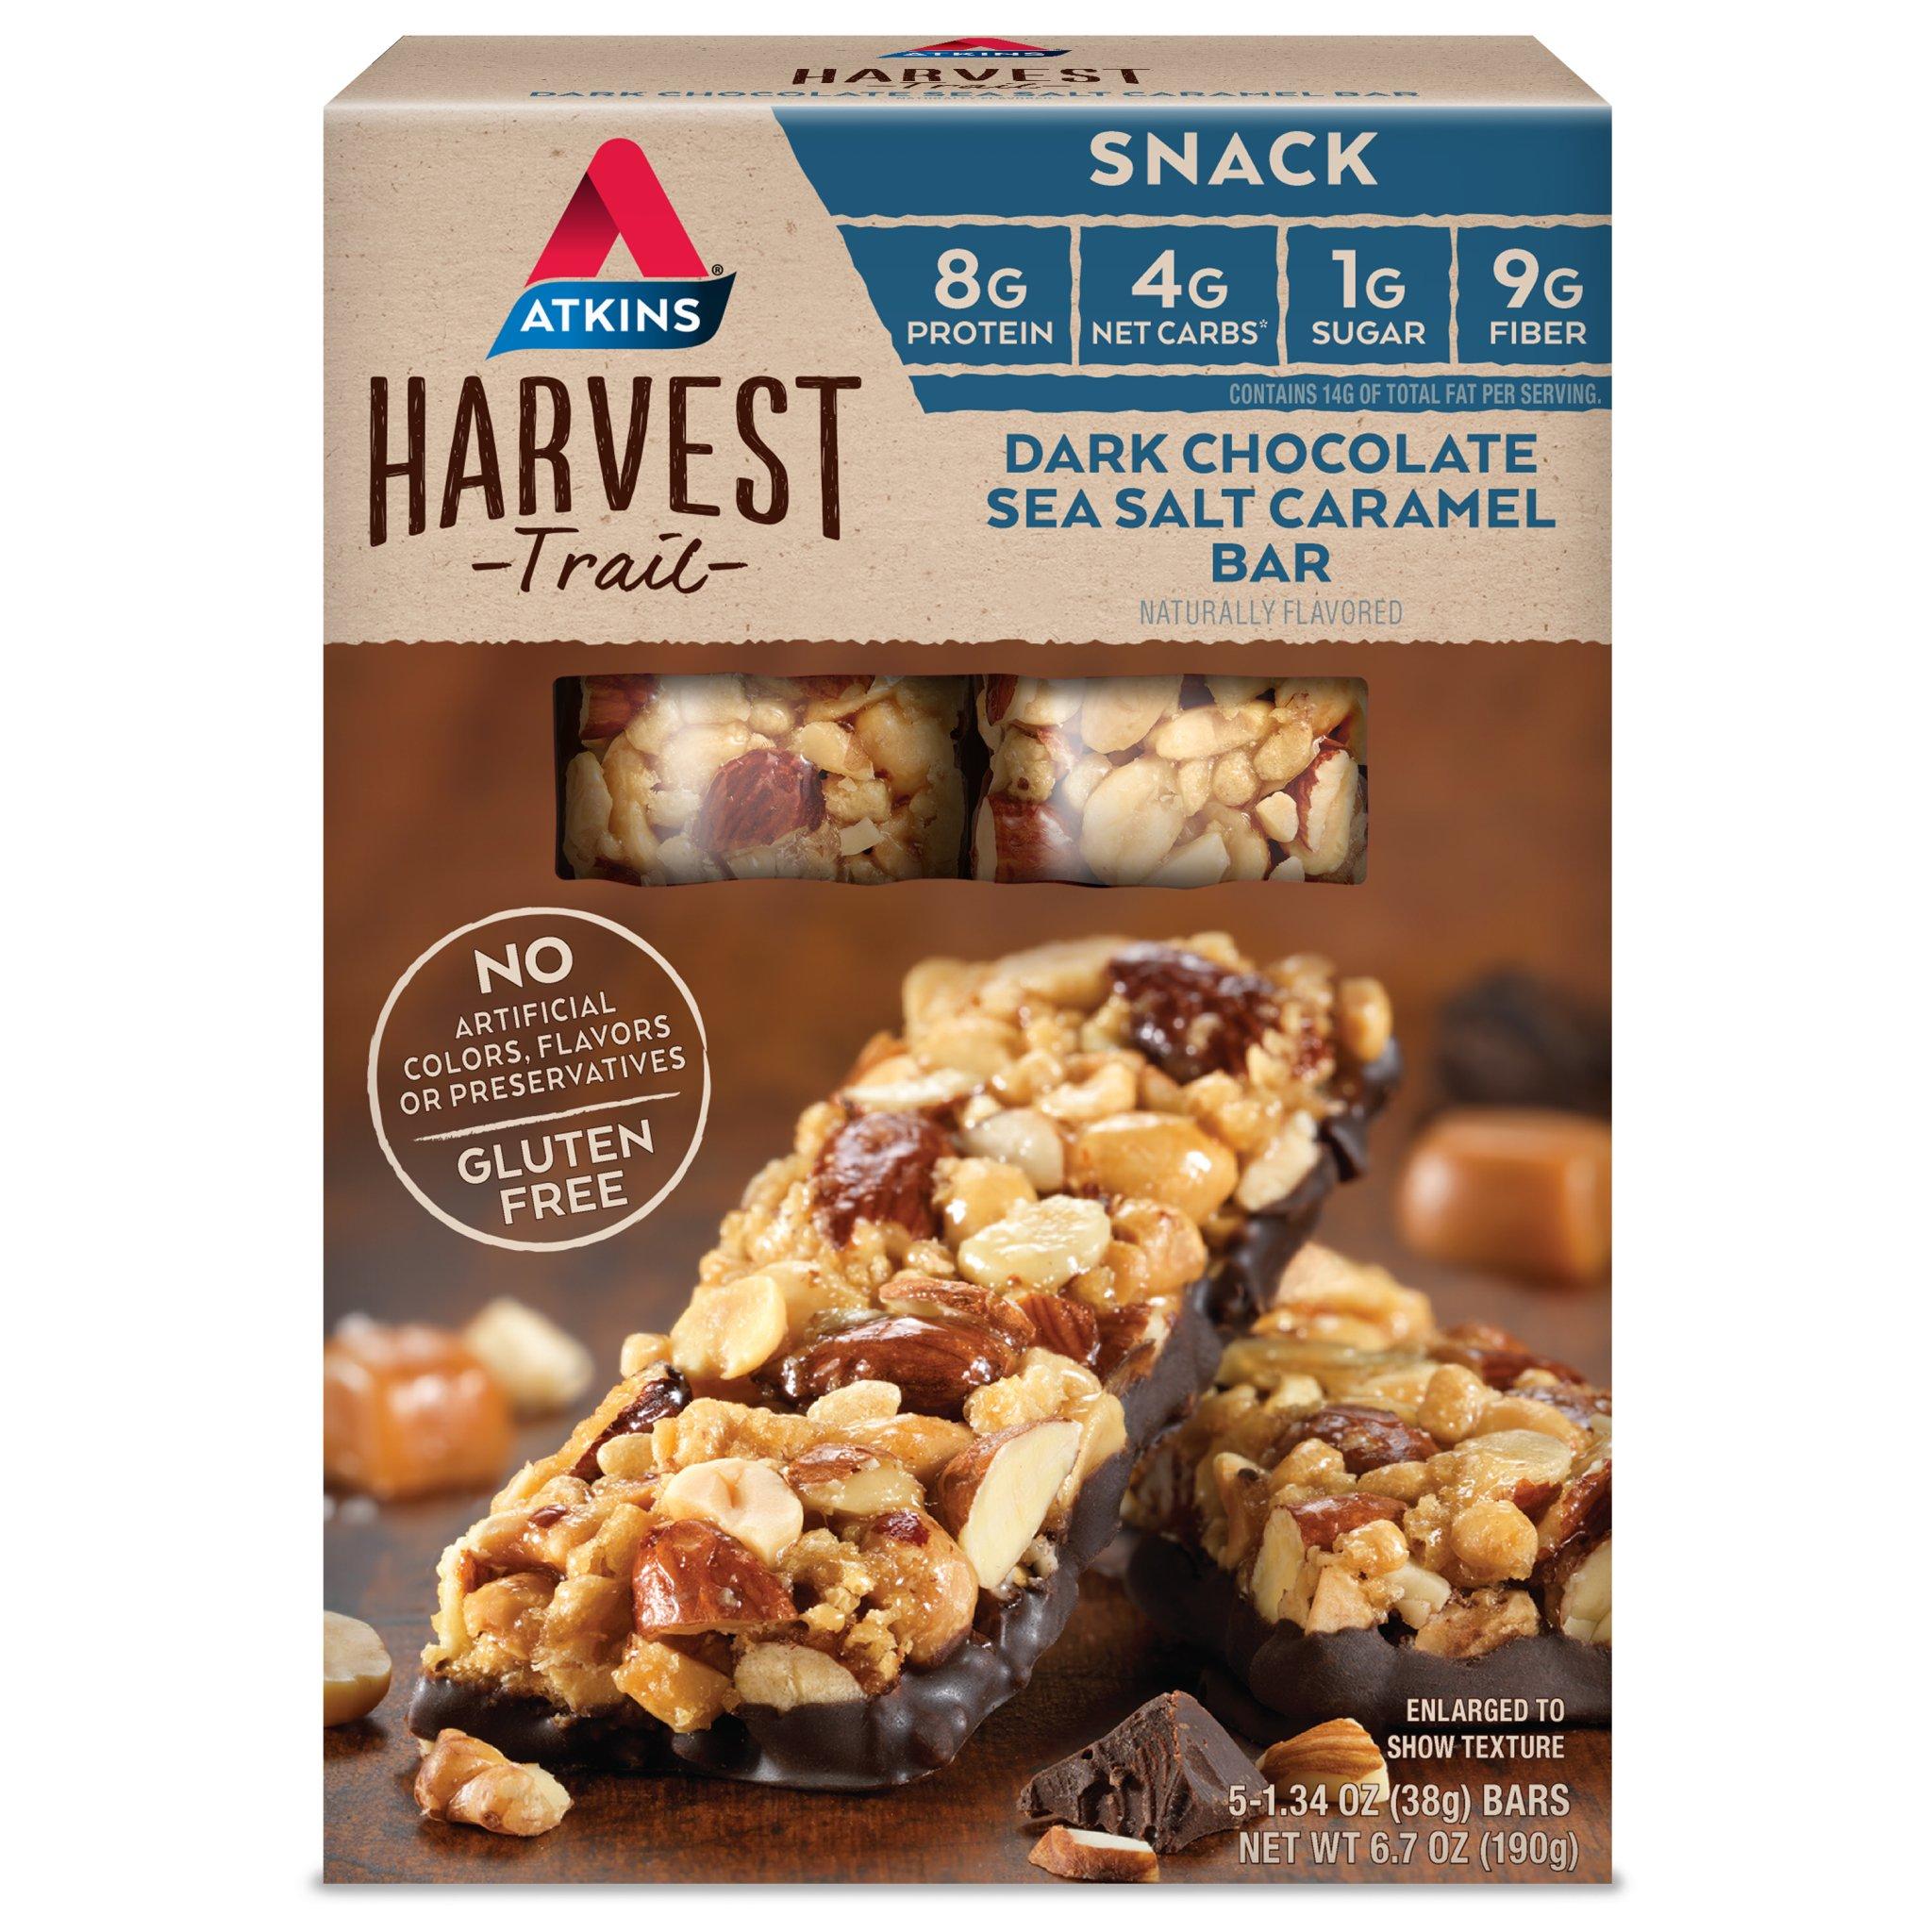 Atkins Harvest Trail Snack Bar, Dark Chocolate Sea Salt Caramel, Gluten Free, 5 Count